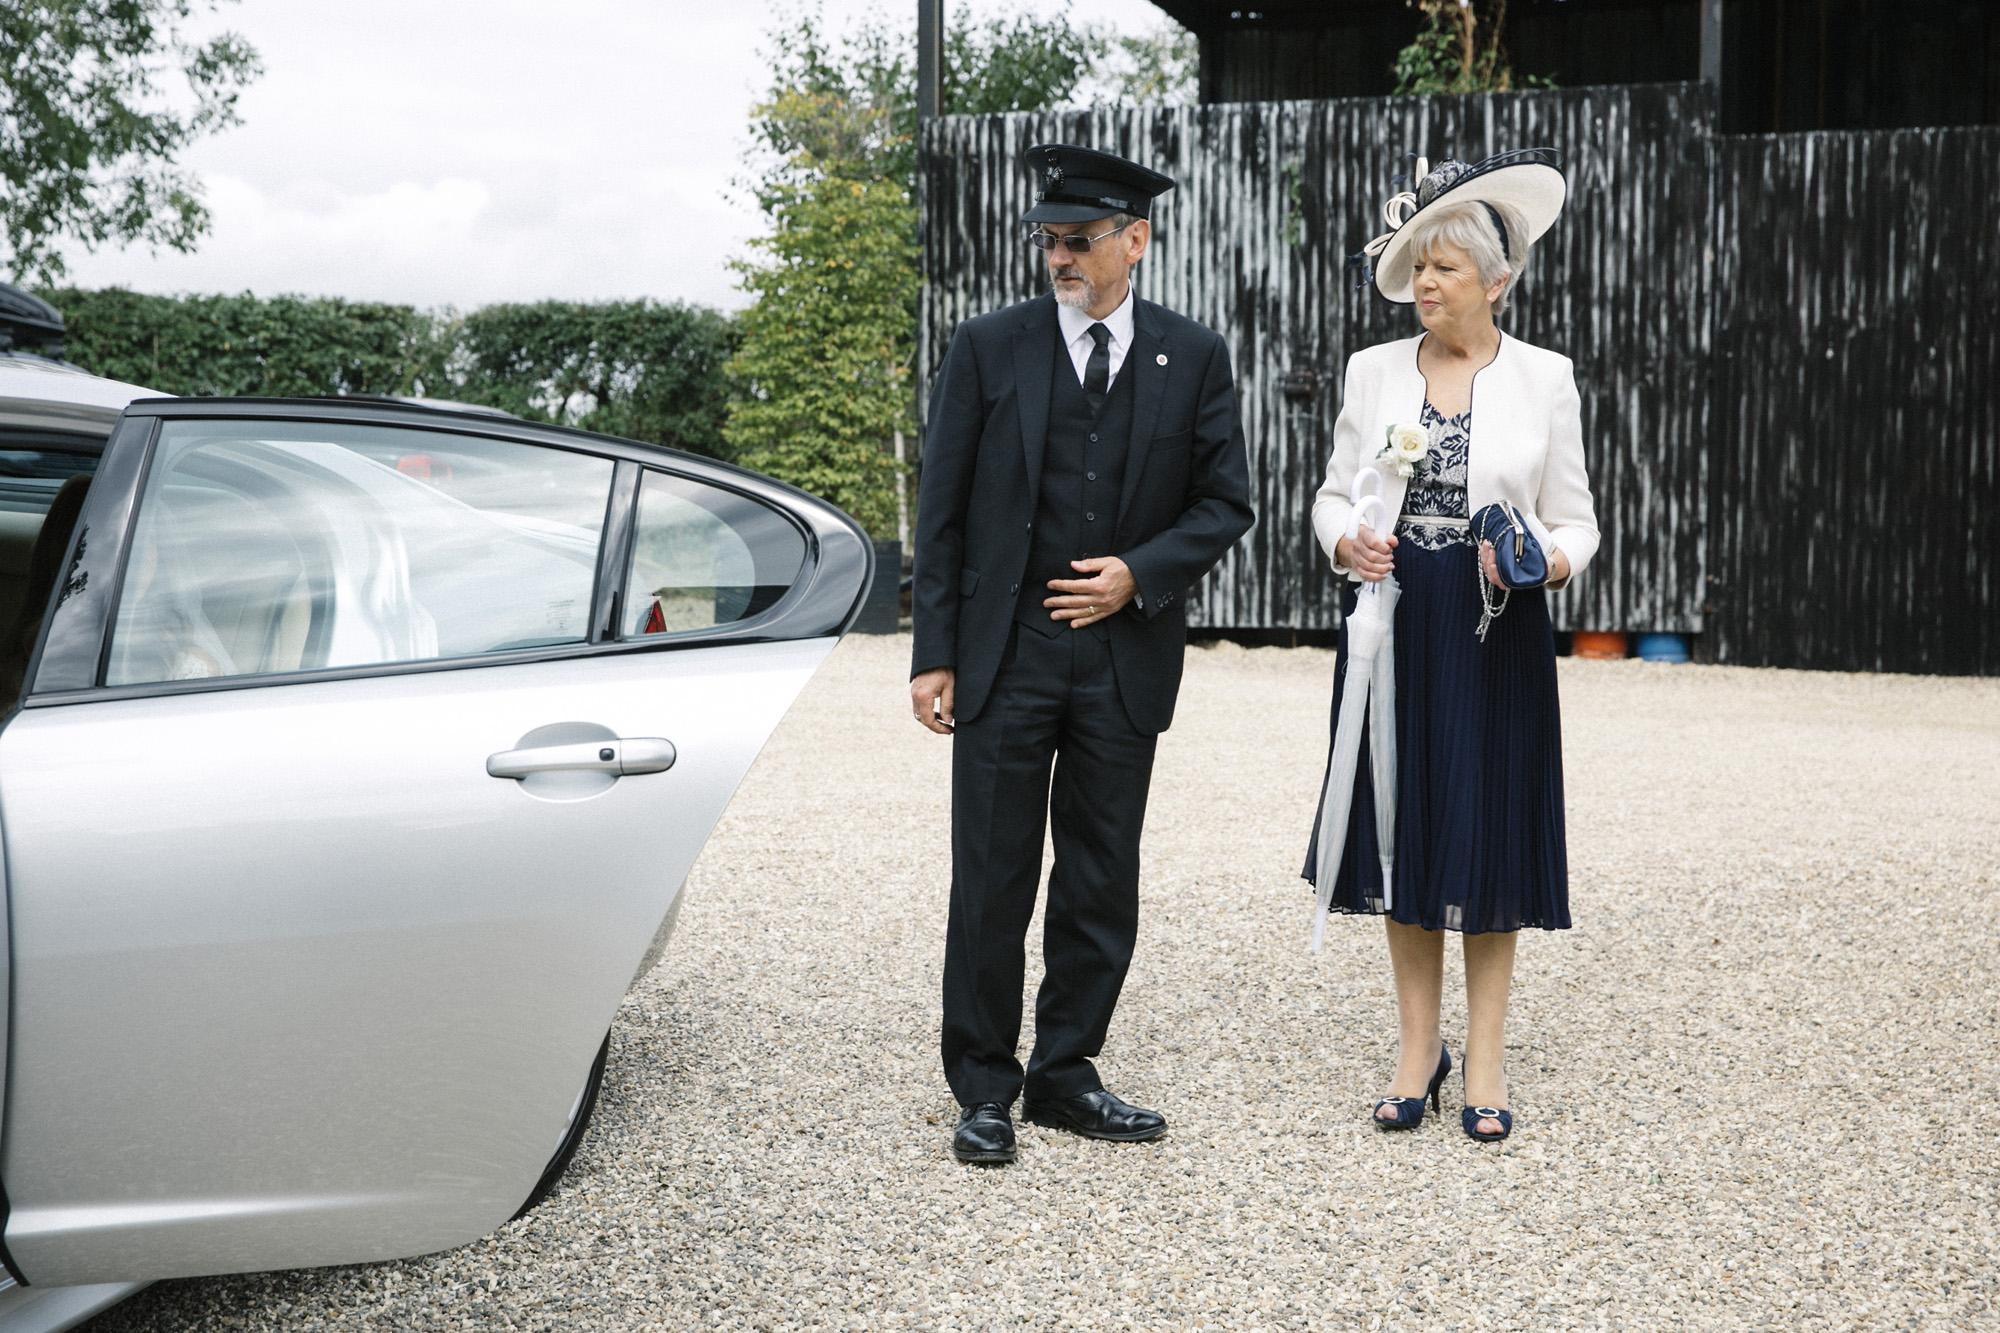 Jaguar XFS and executive chauffeur